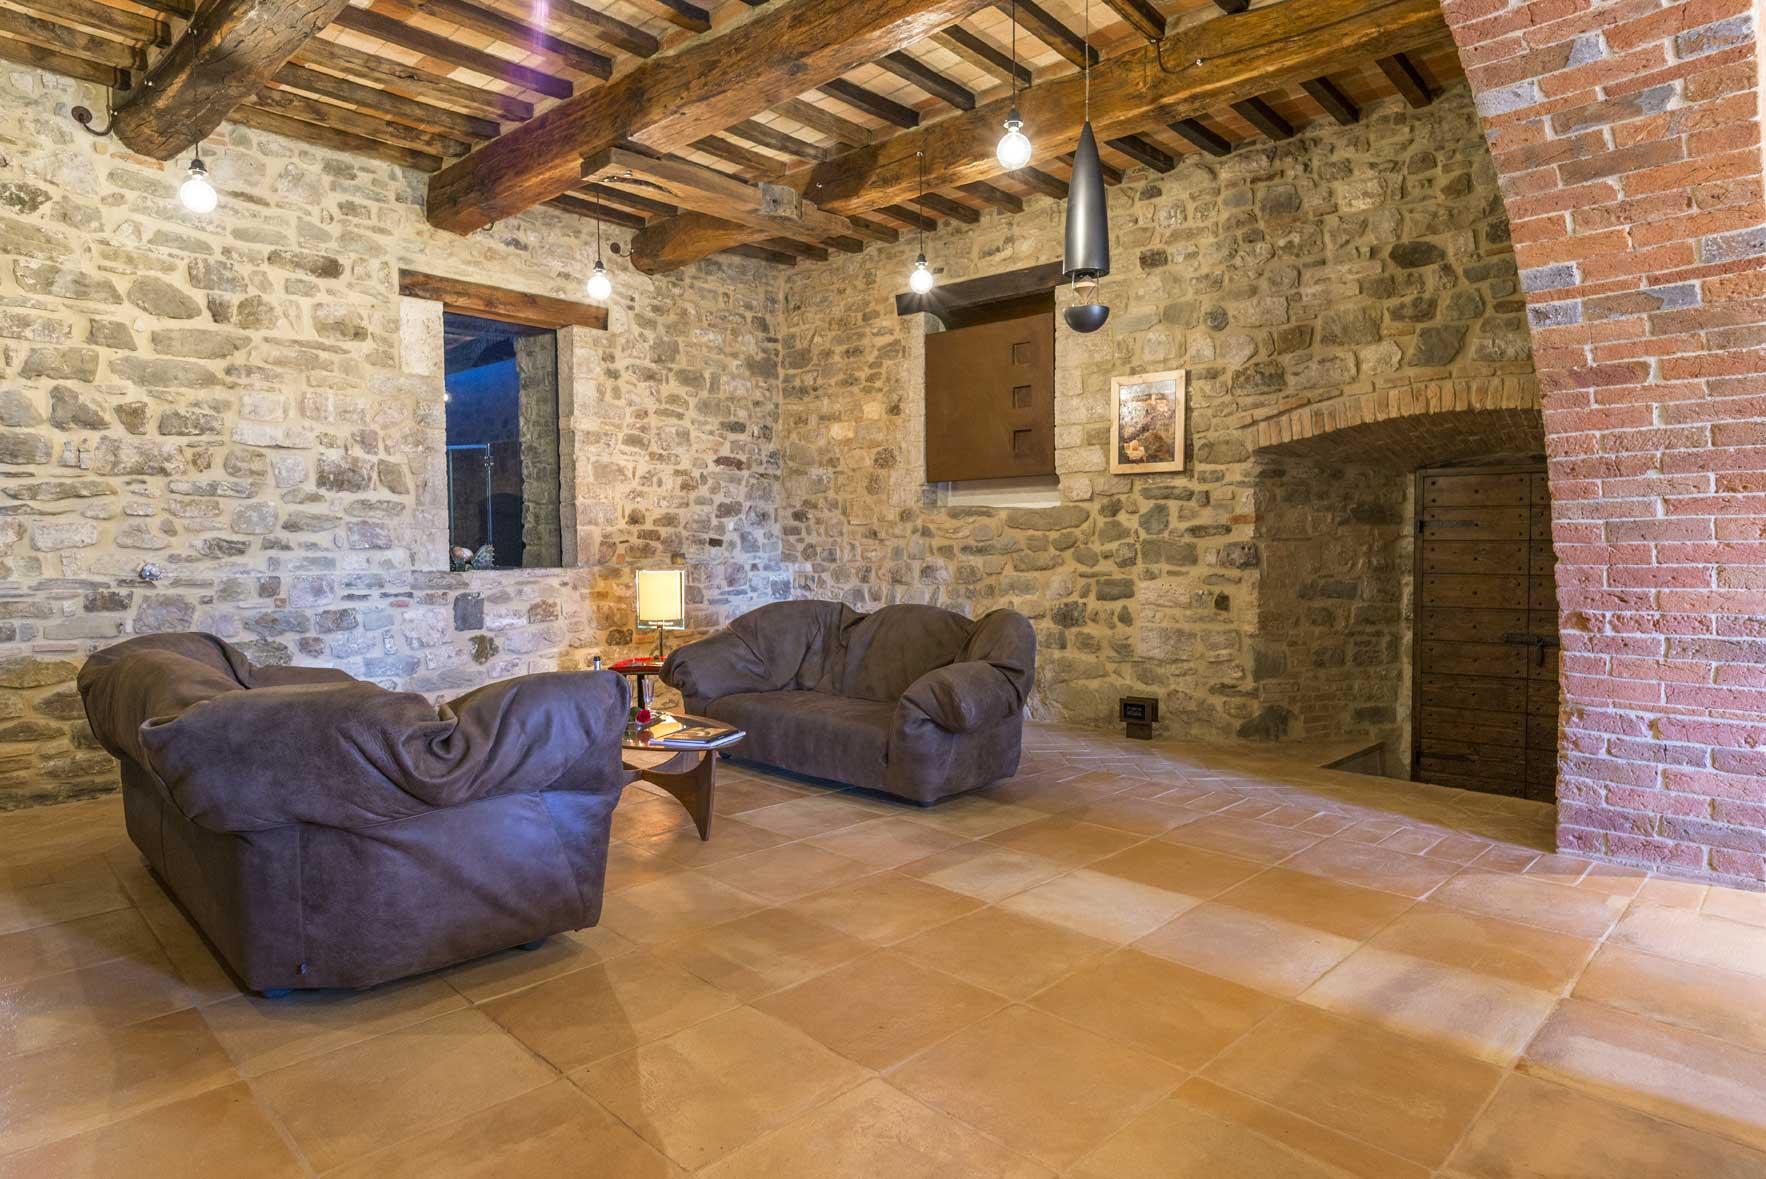 Pavimenti in finta pietra per interni - Interni rustici ...